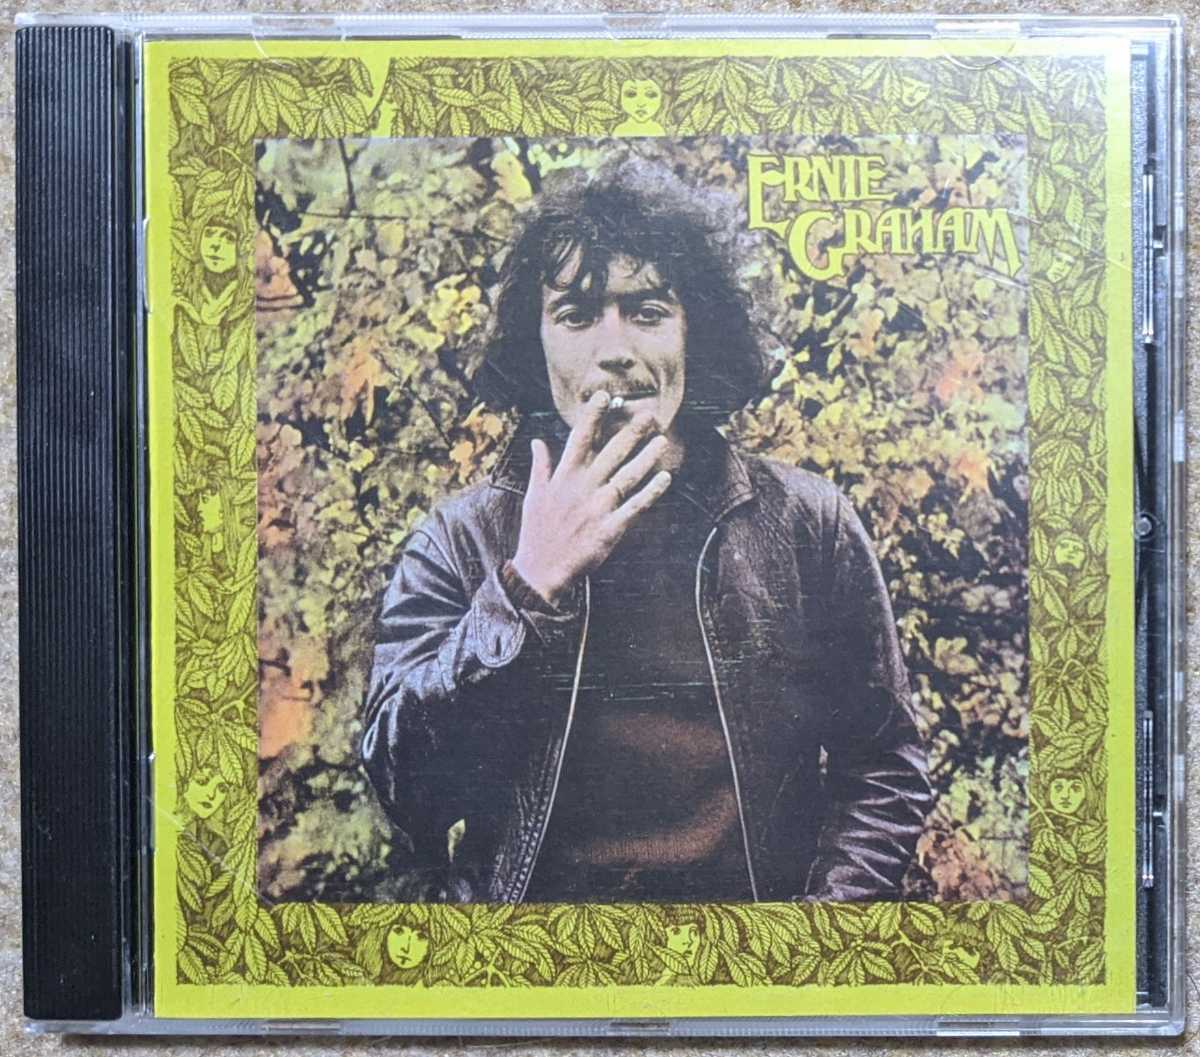 Ernie Graham★英ボートラ2曲収録CD/Nick Lowe/Ian Gomm/Brinsley Schwarz/Help Yourself/SSW名盤_画像1